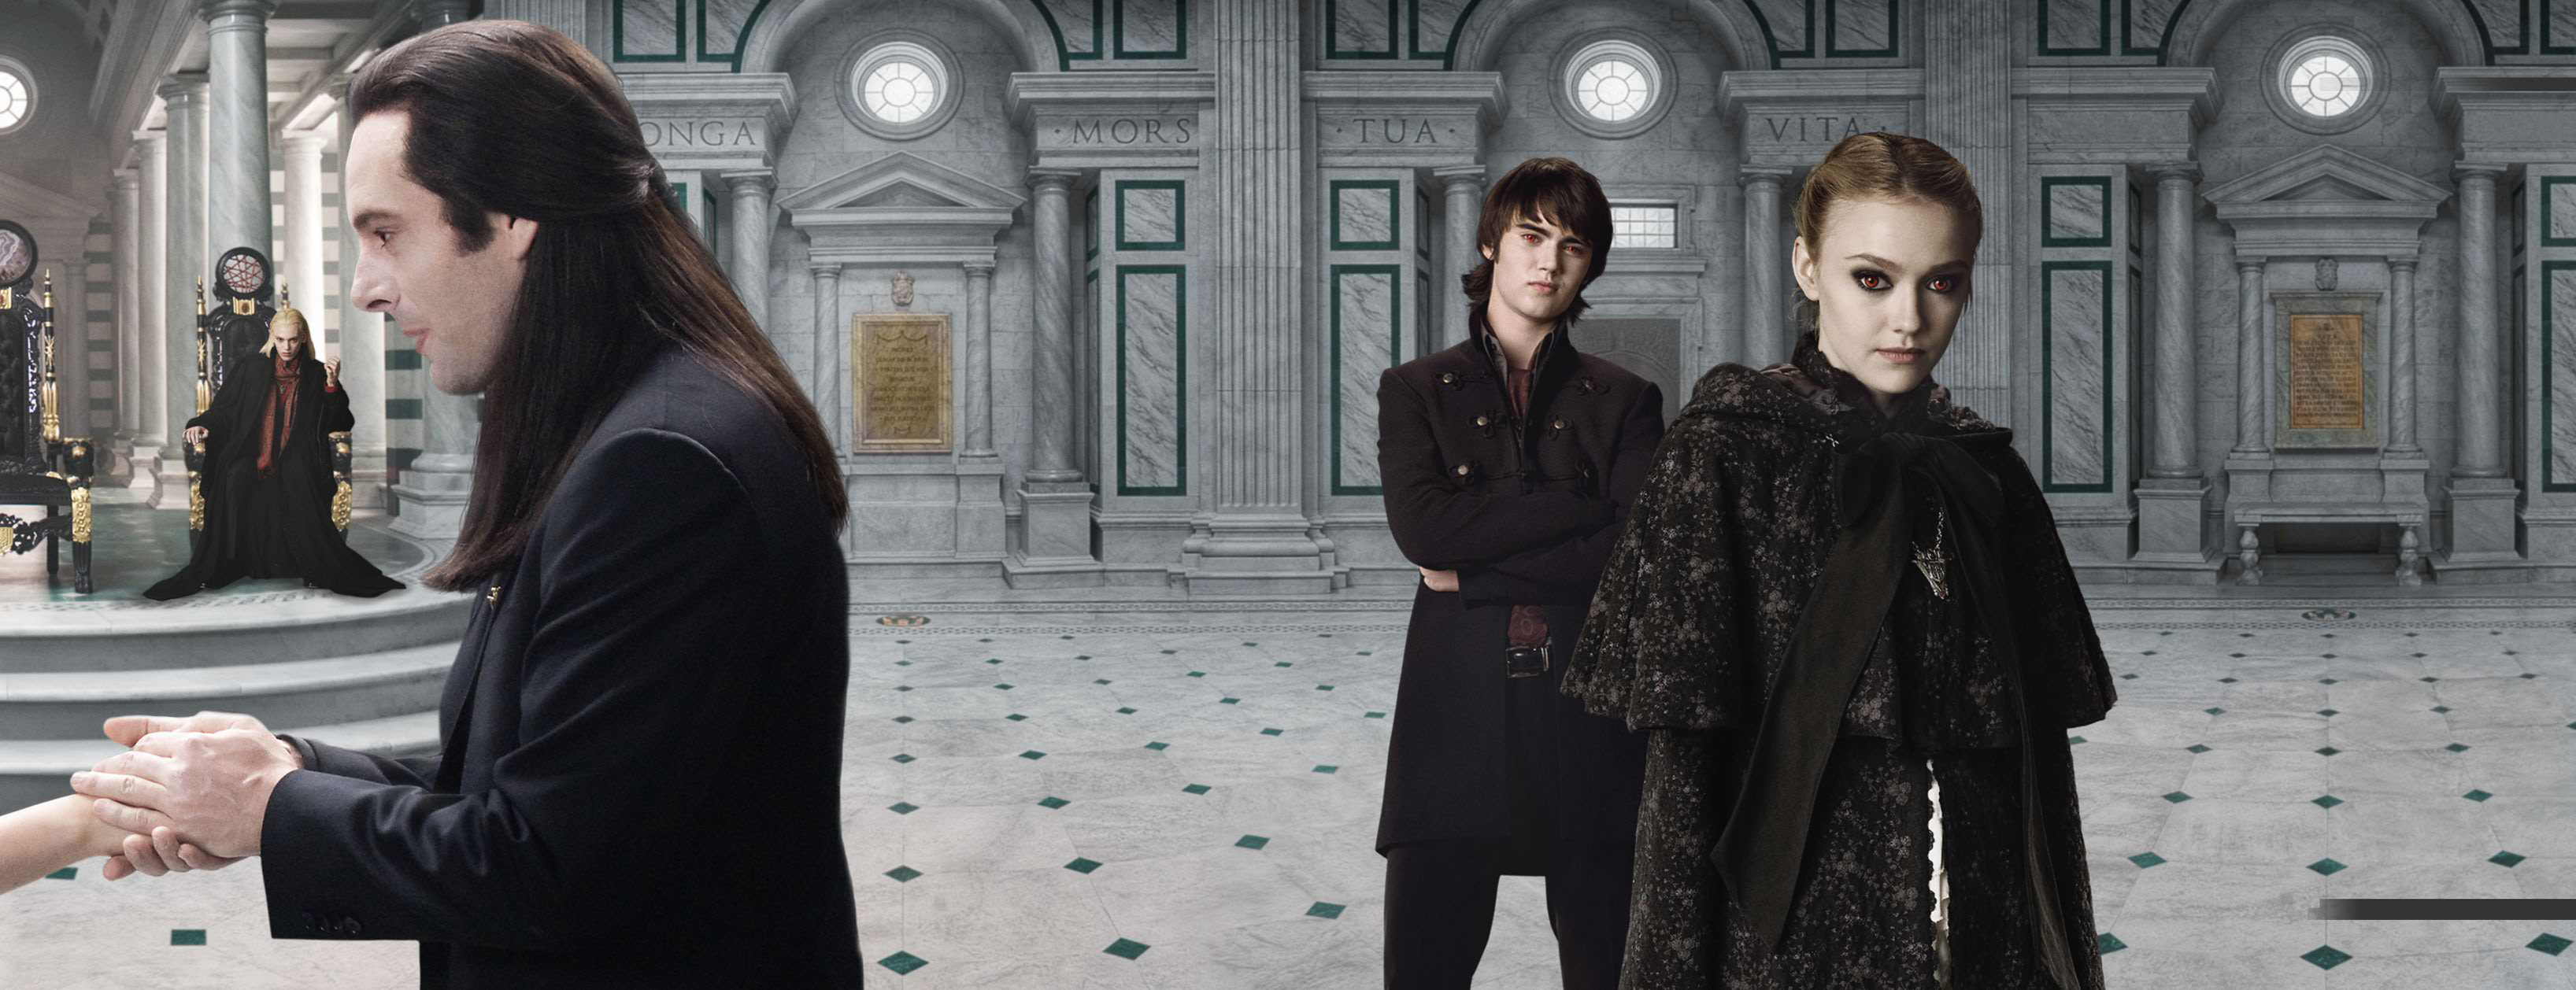 Twilight Character Volturi Characters in Twilight